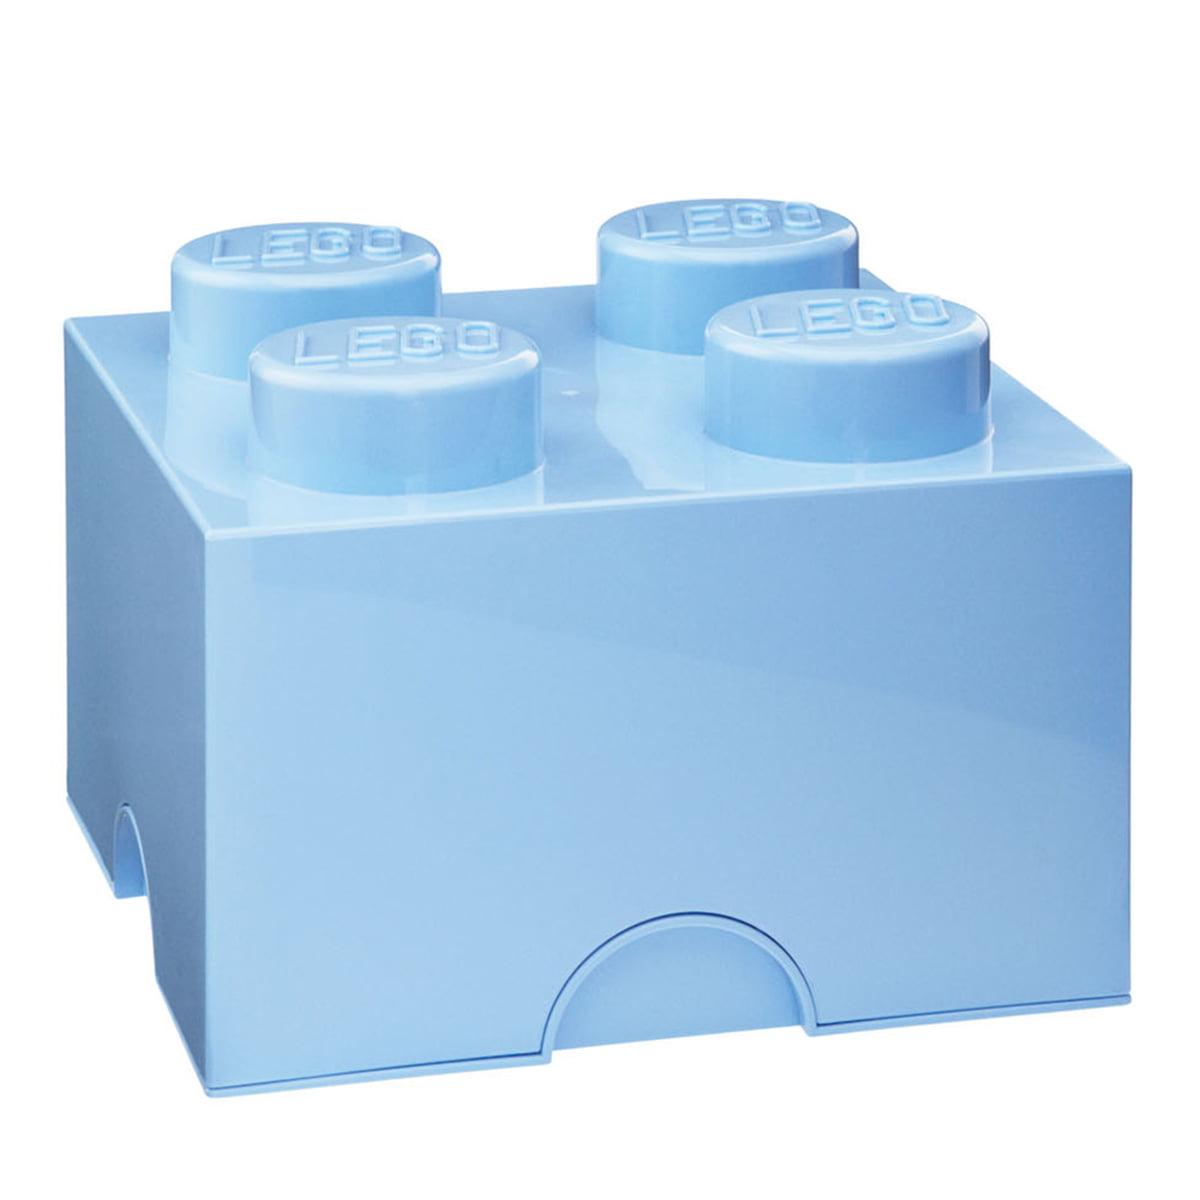 Lego - Storage Brick 4, hellblau | Kinderzimmer > Spielzeuge > Sonstige Spielzeuge | Hellblau | Lego